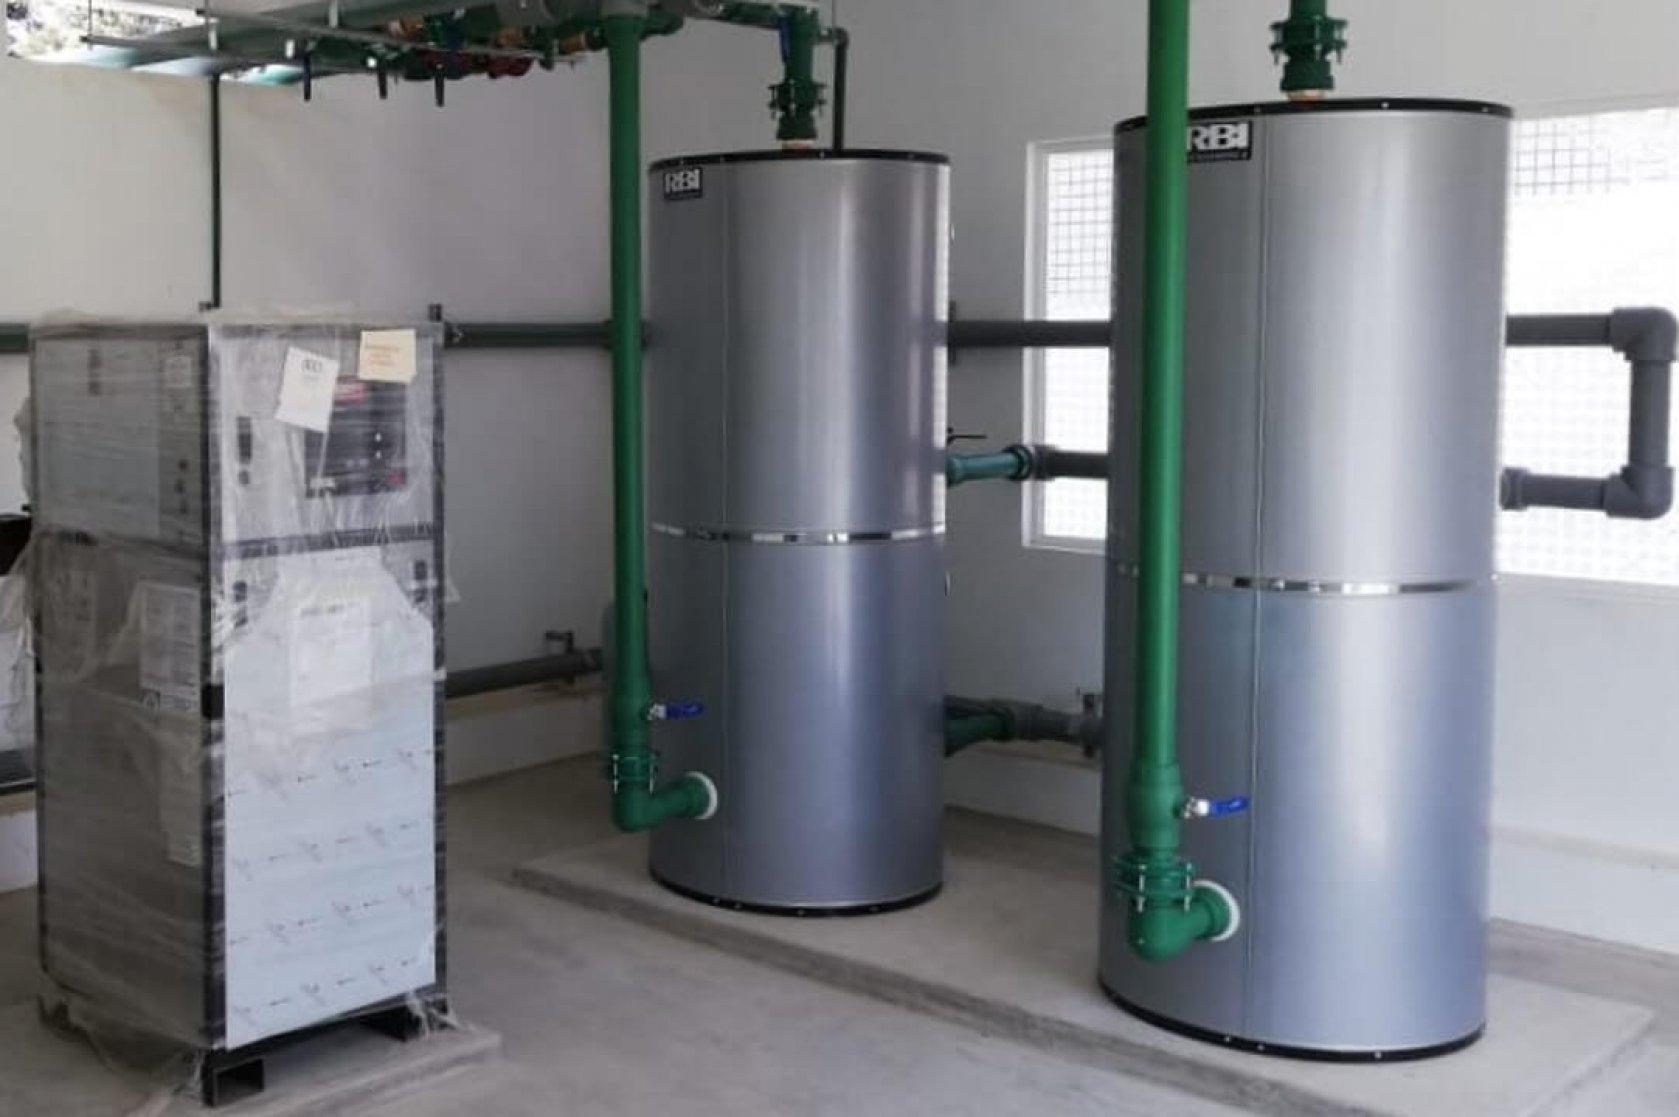 saunas-tanques-almacenamiento-1